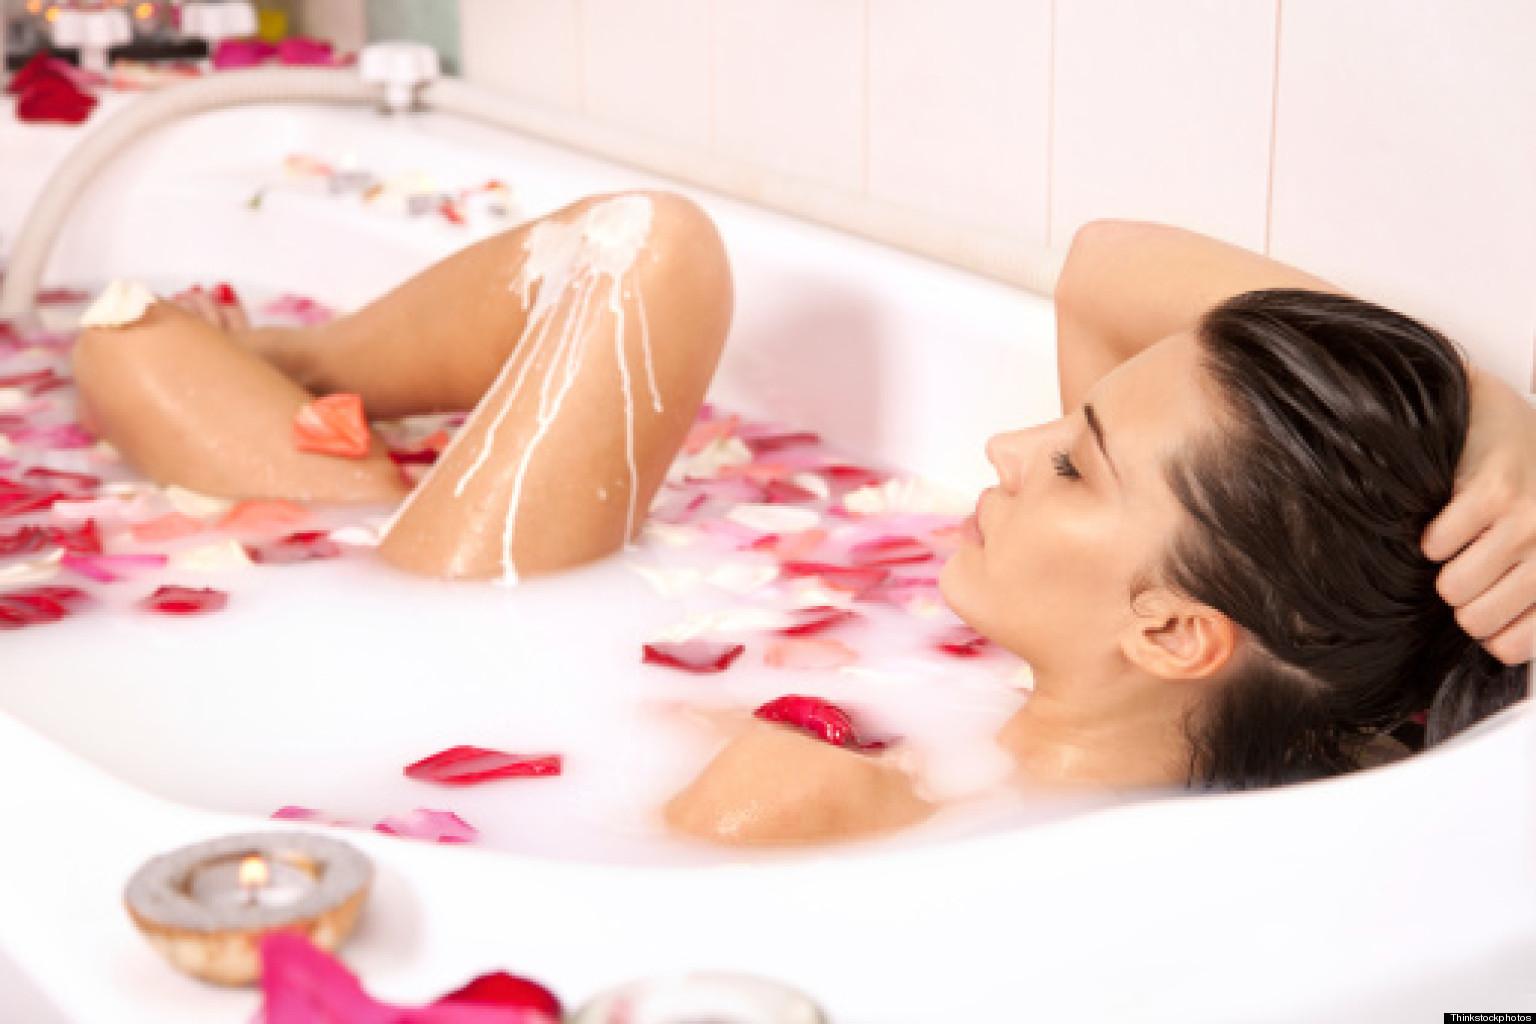 Фото девушек в ванне с лепестками роз 23 фотография